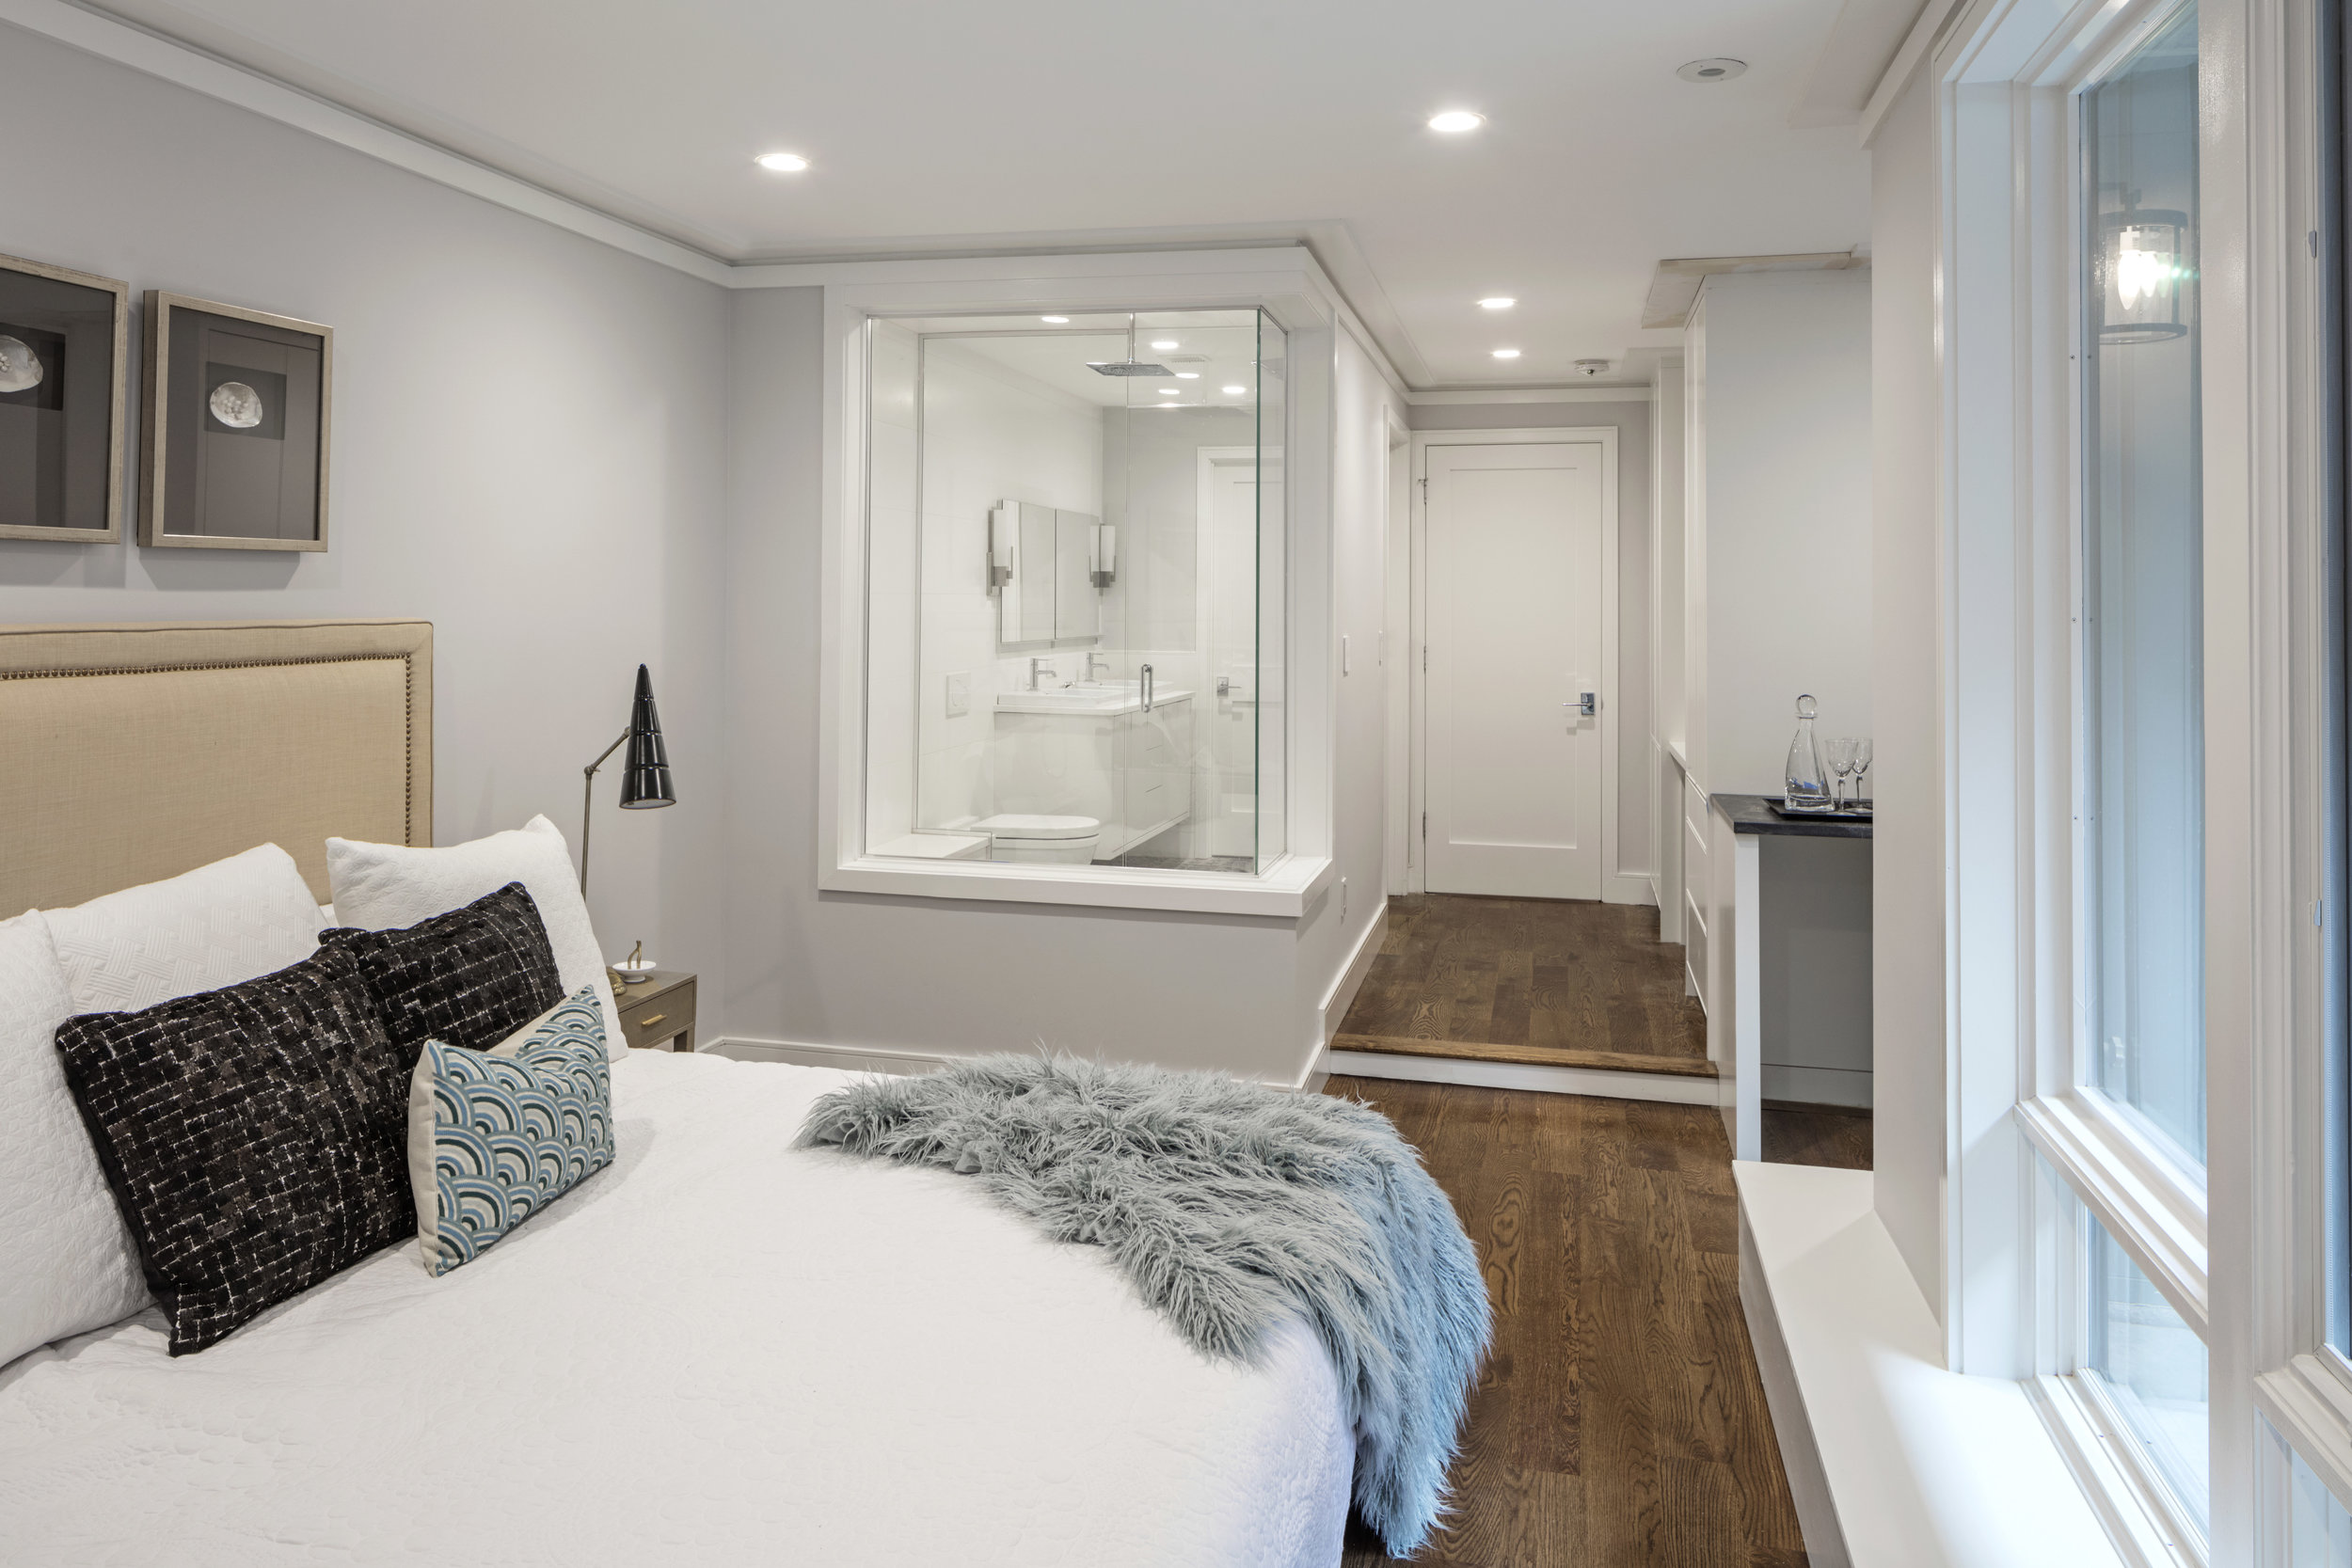 1 - Bed lower.jpg